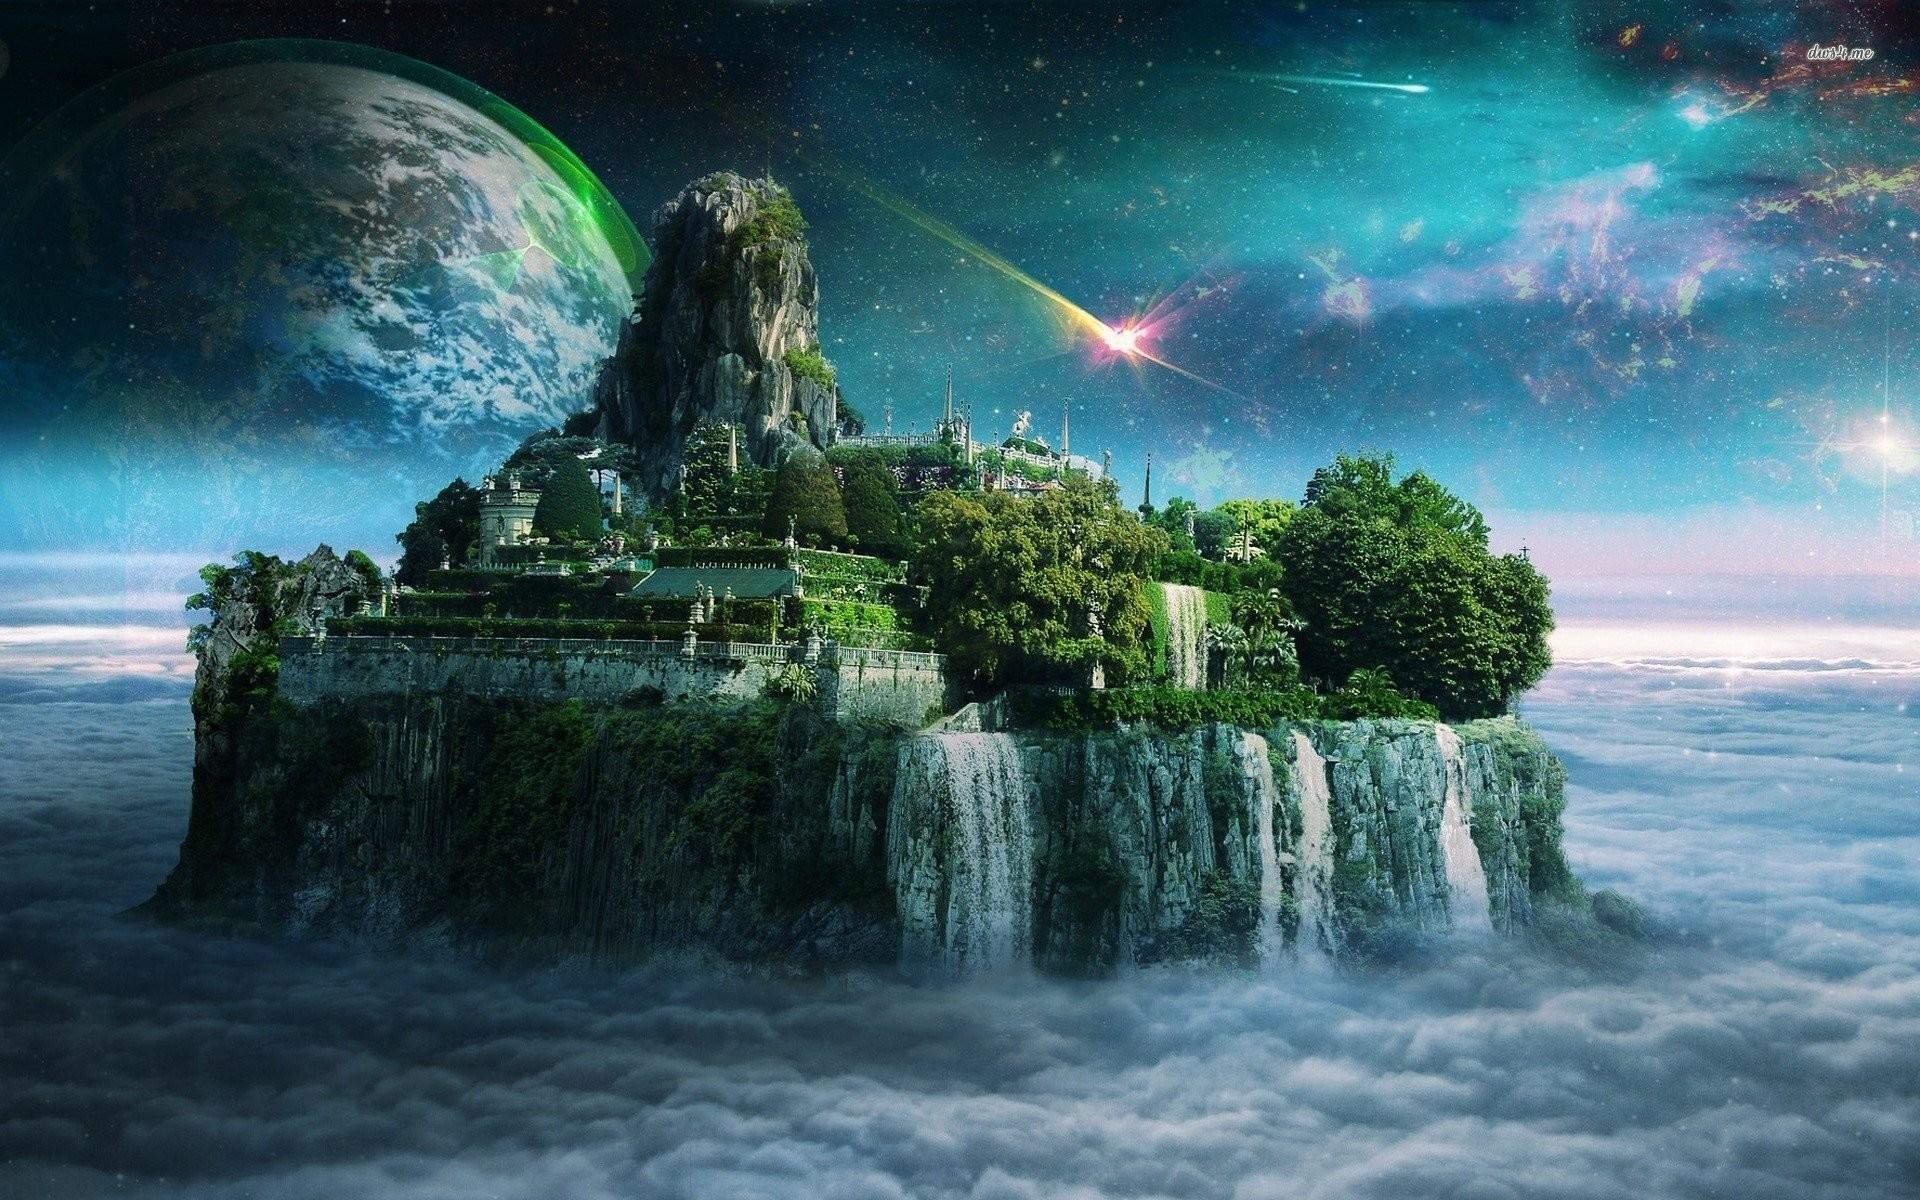 Beautifull Sky Wallpapers | sky & Planets HD Wallpapers | Pinterest | Hd  wallpaper, Wallpaper and Galaxy hd